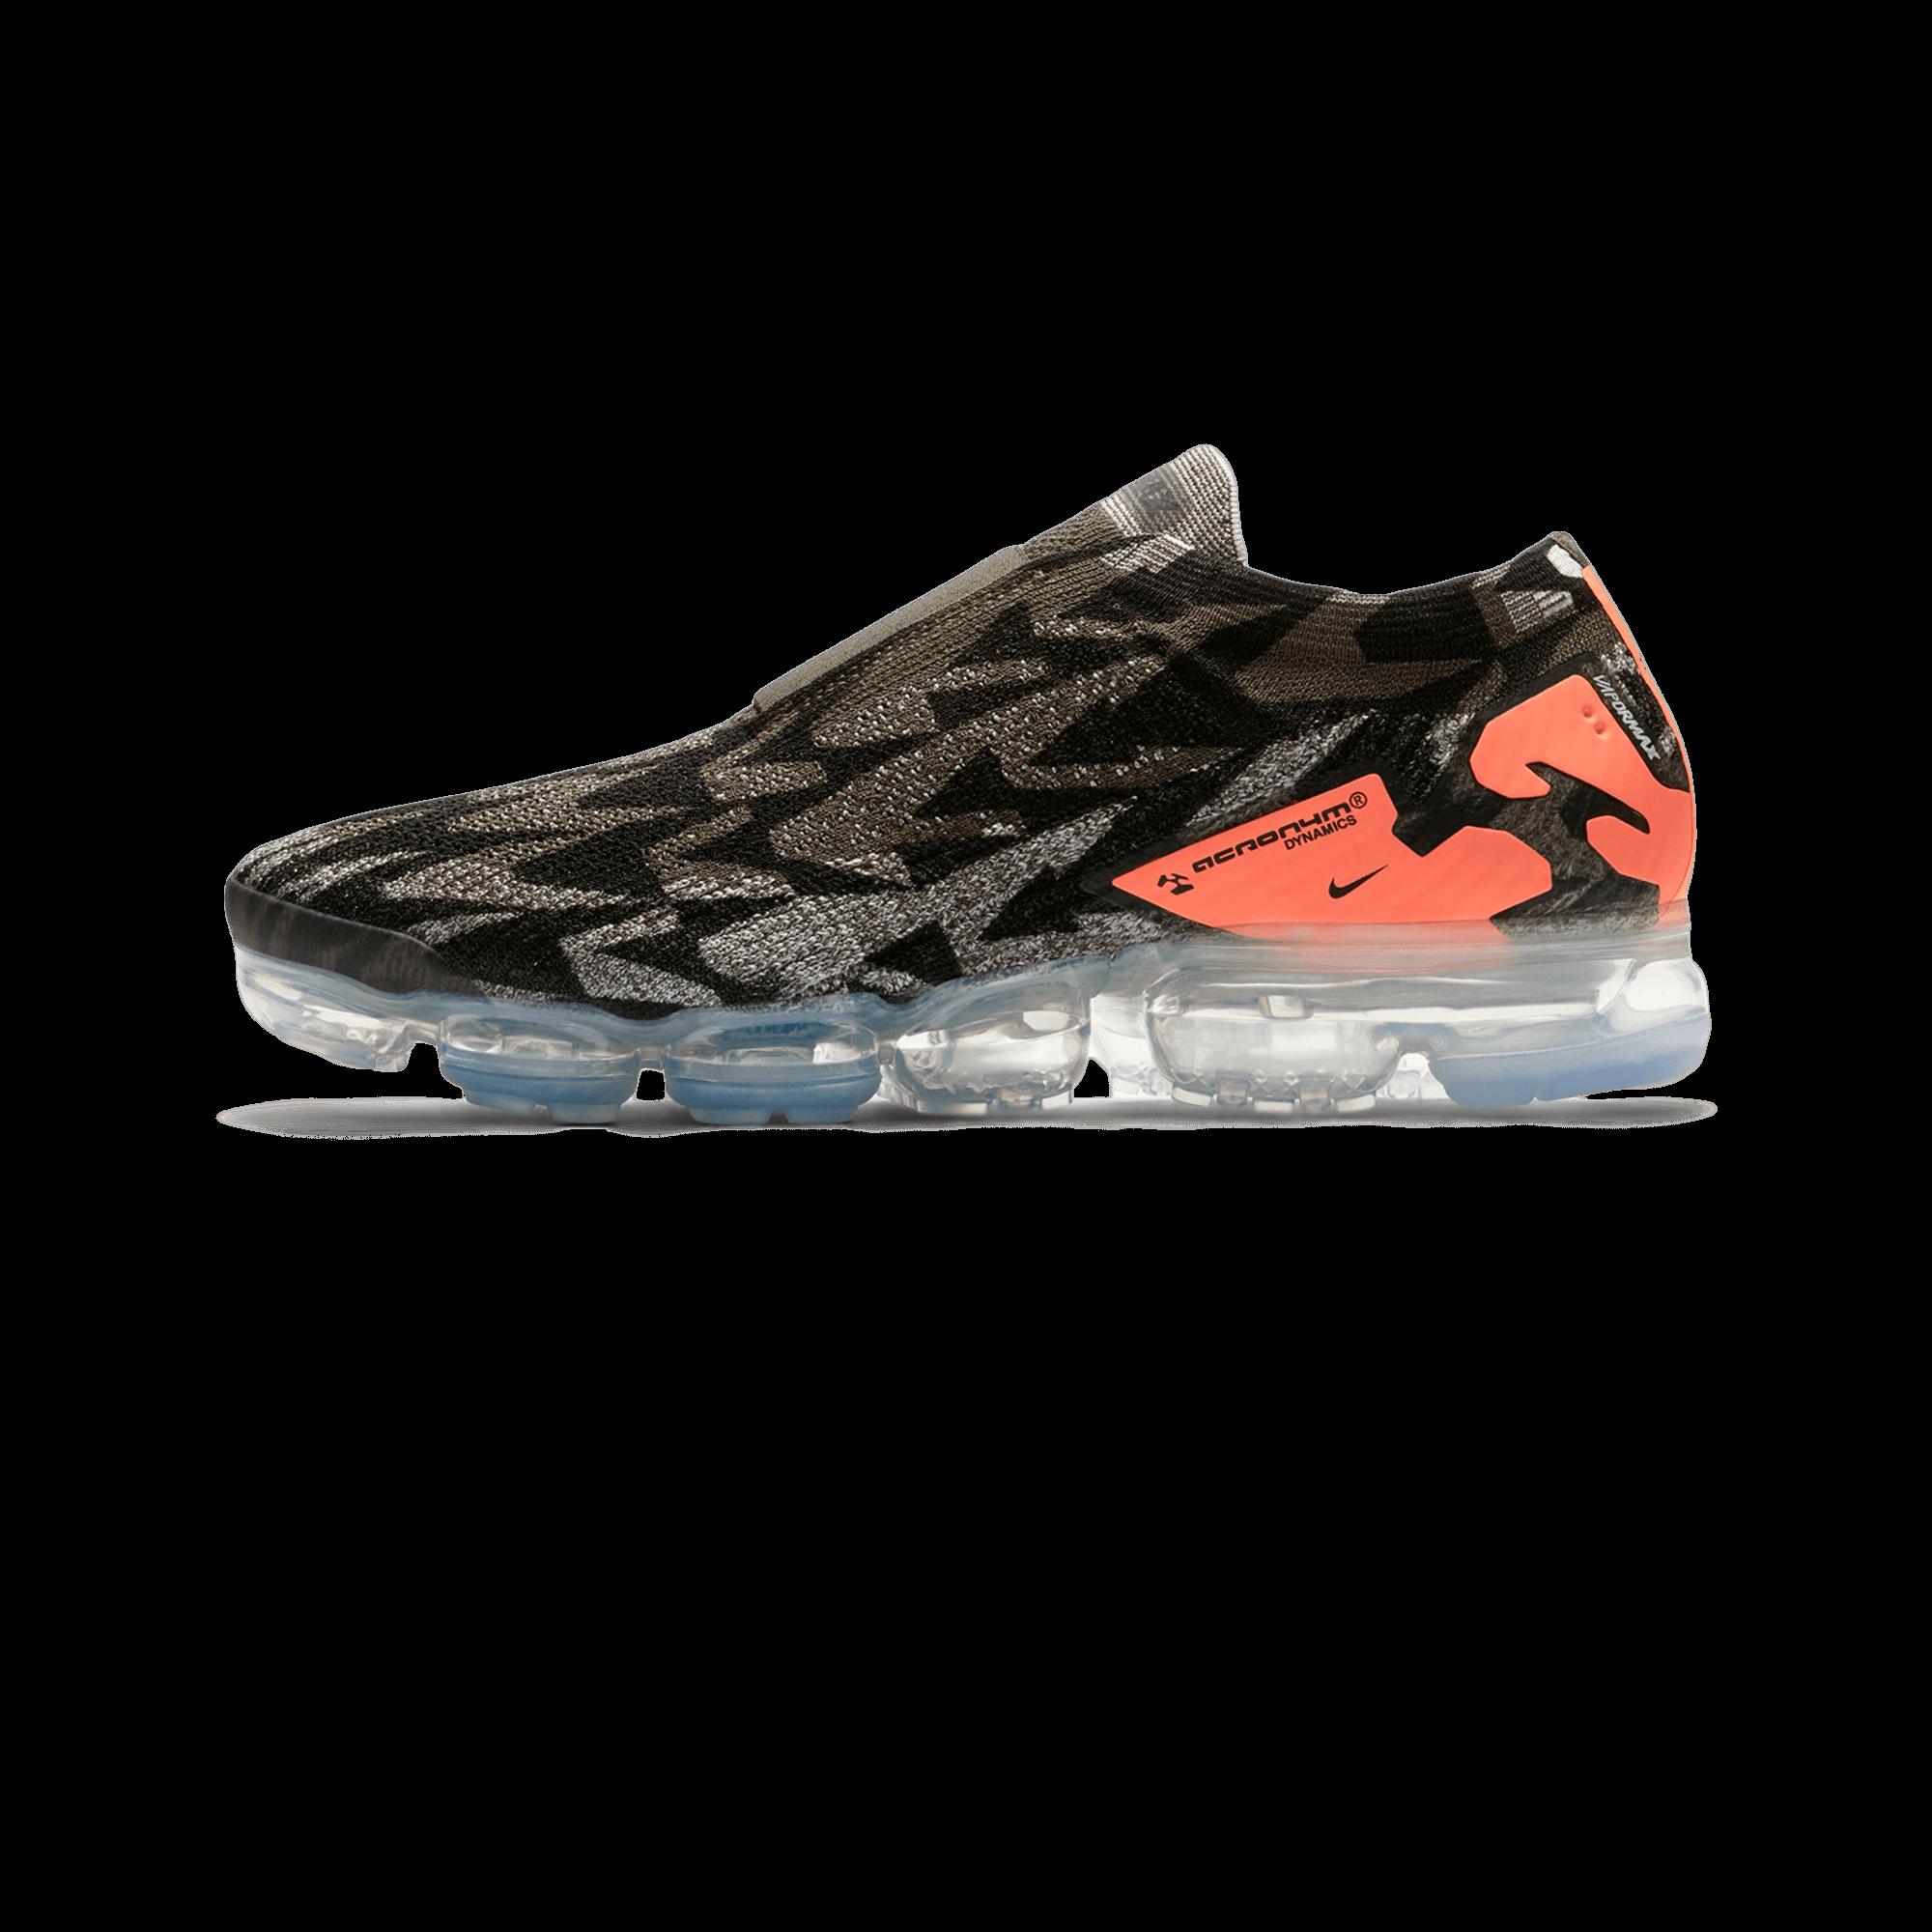 the latest 8f792 956ef Nike Air Vapormax FK Moc 2 X Acronym black / orange - Men | Holypopstore.com